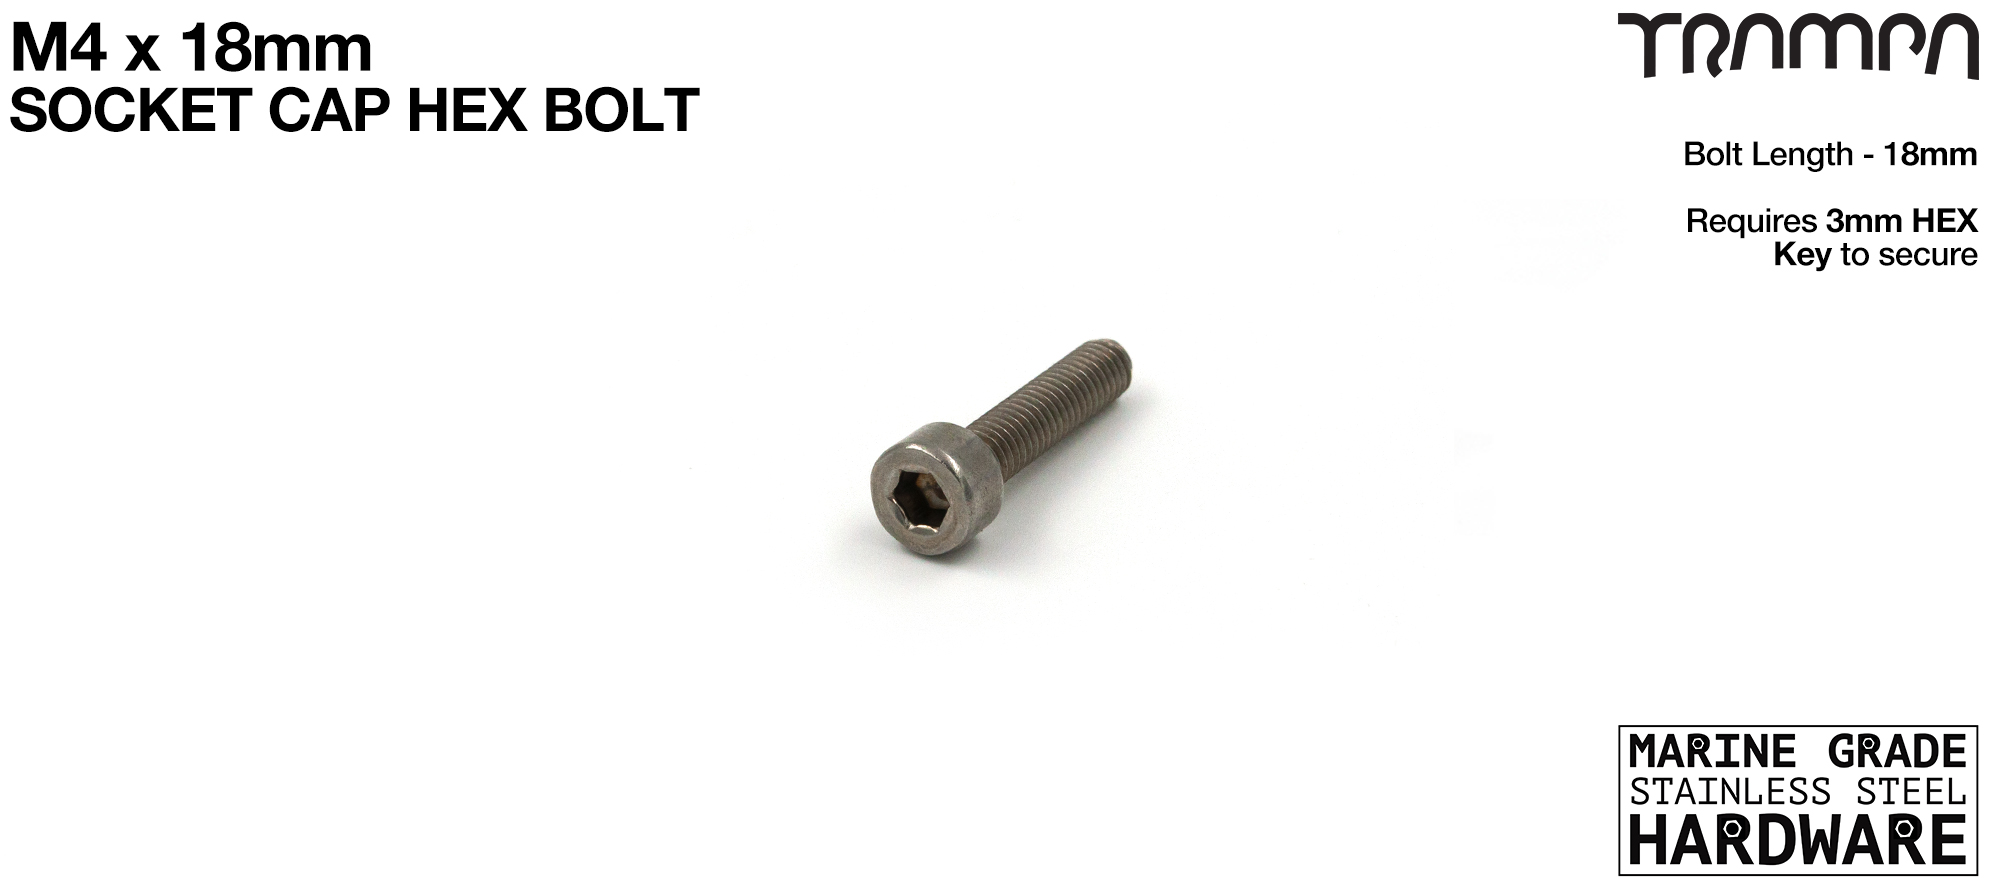 M4 x 18mm Socket Capped Head Bolt ISO 4762 Marine Grade Stainless Steel